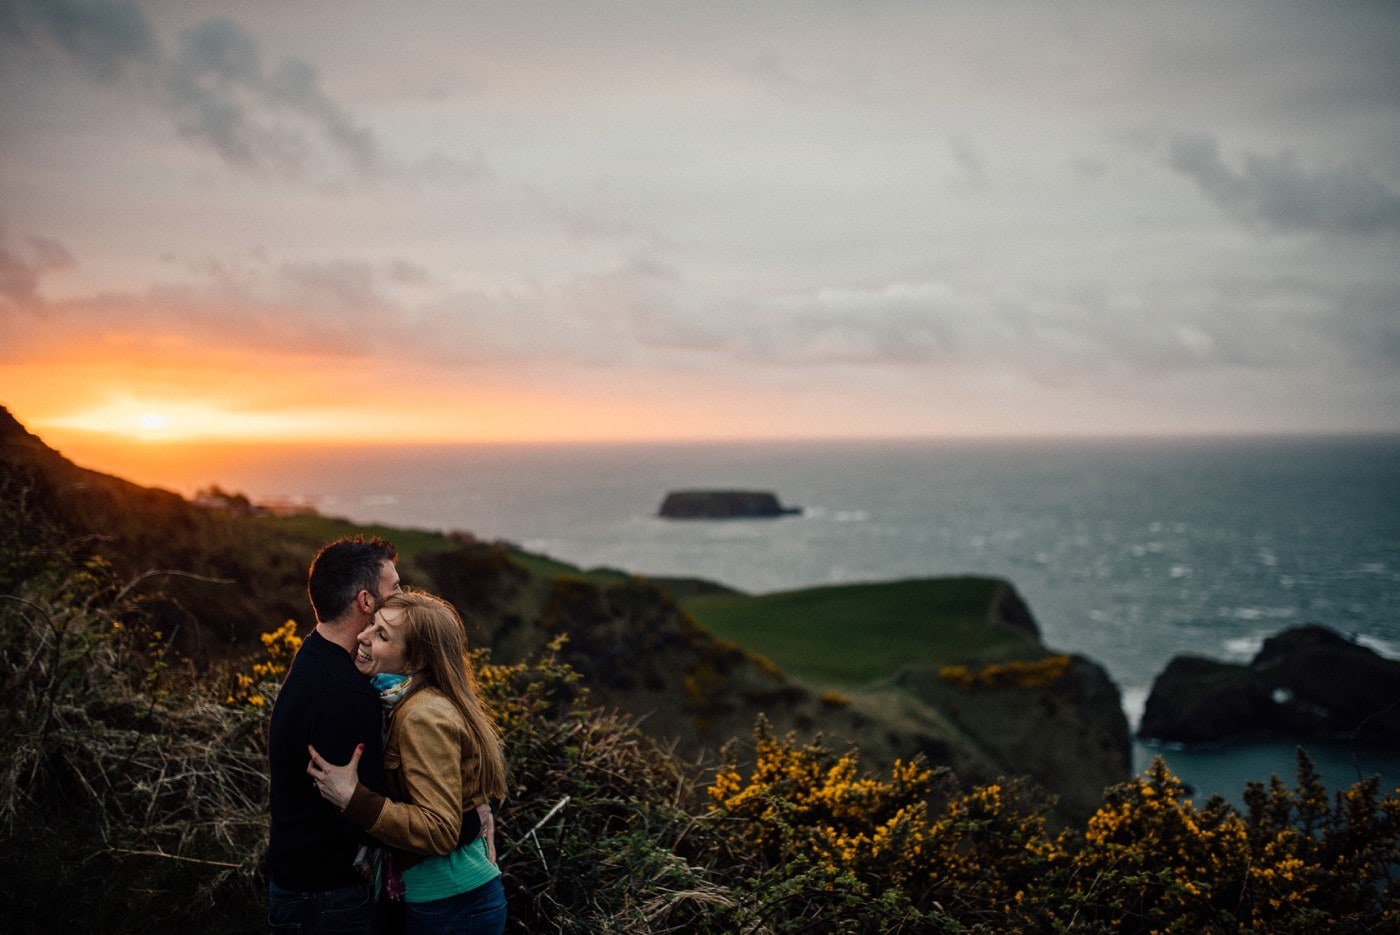 ballintoy-harbour-engagement-wedding-photographer-northern-ireland_0033